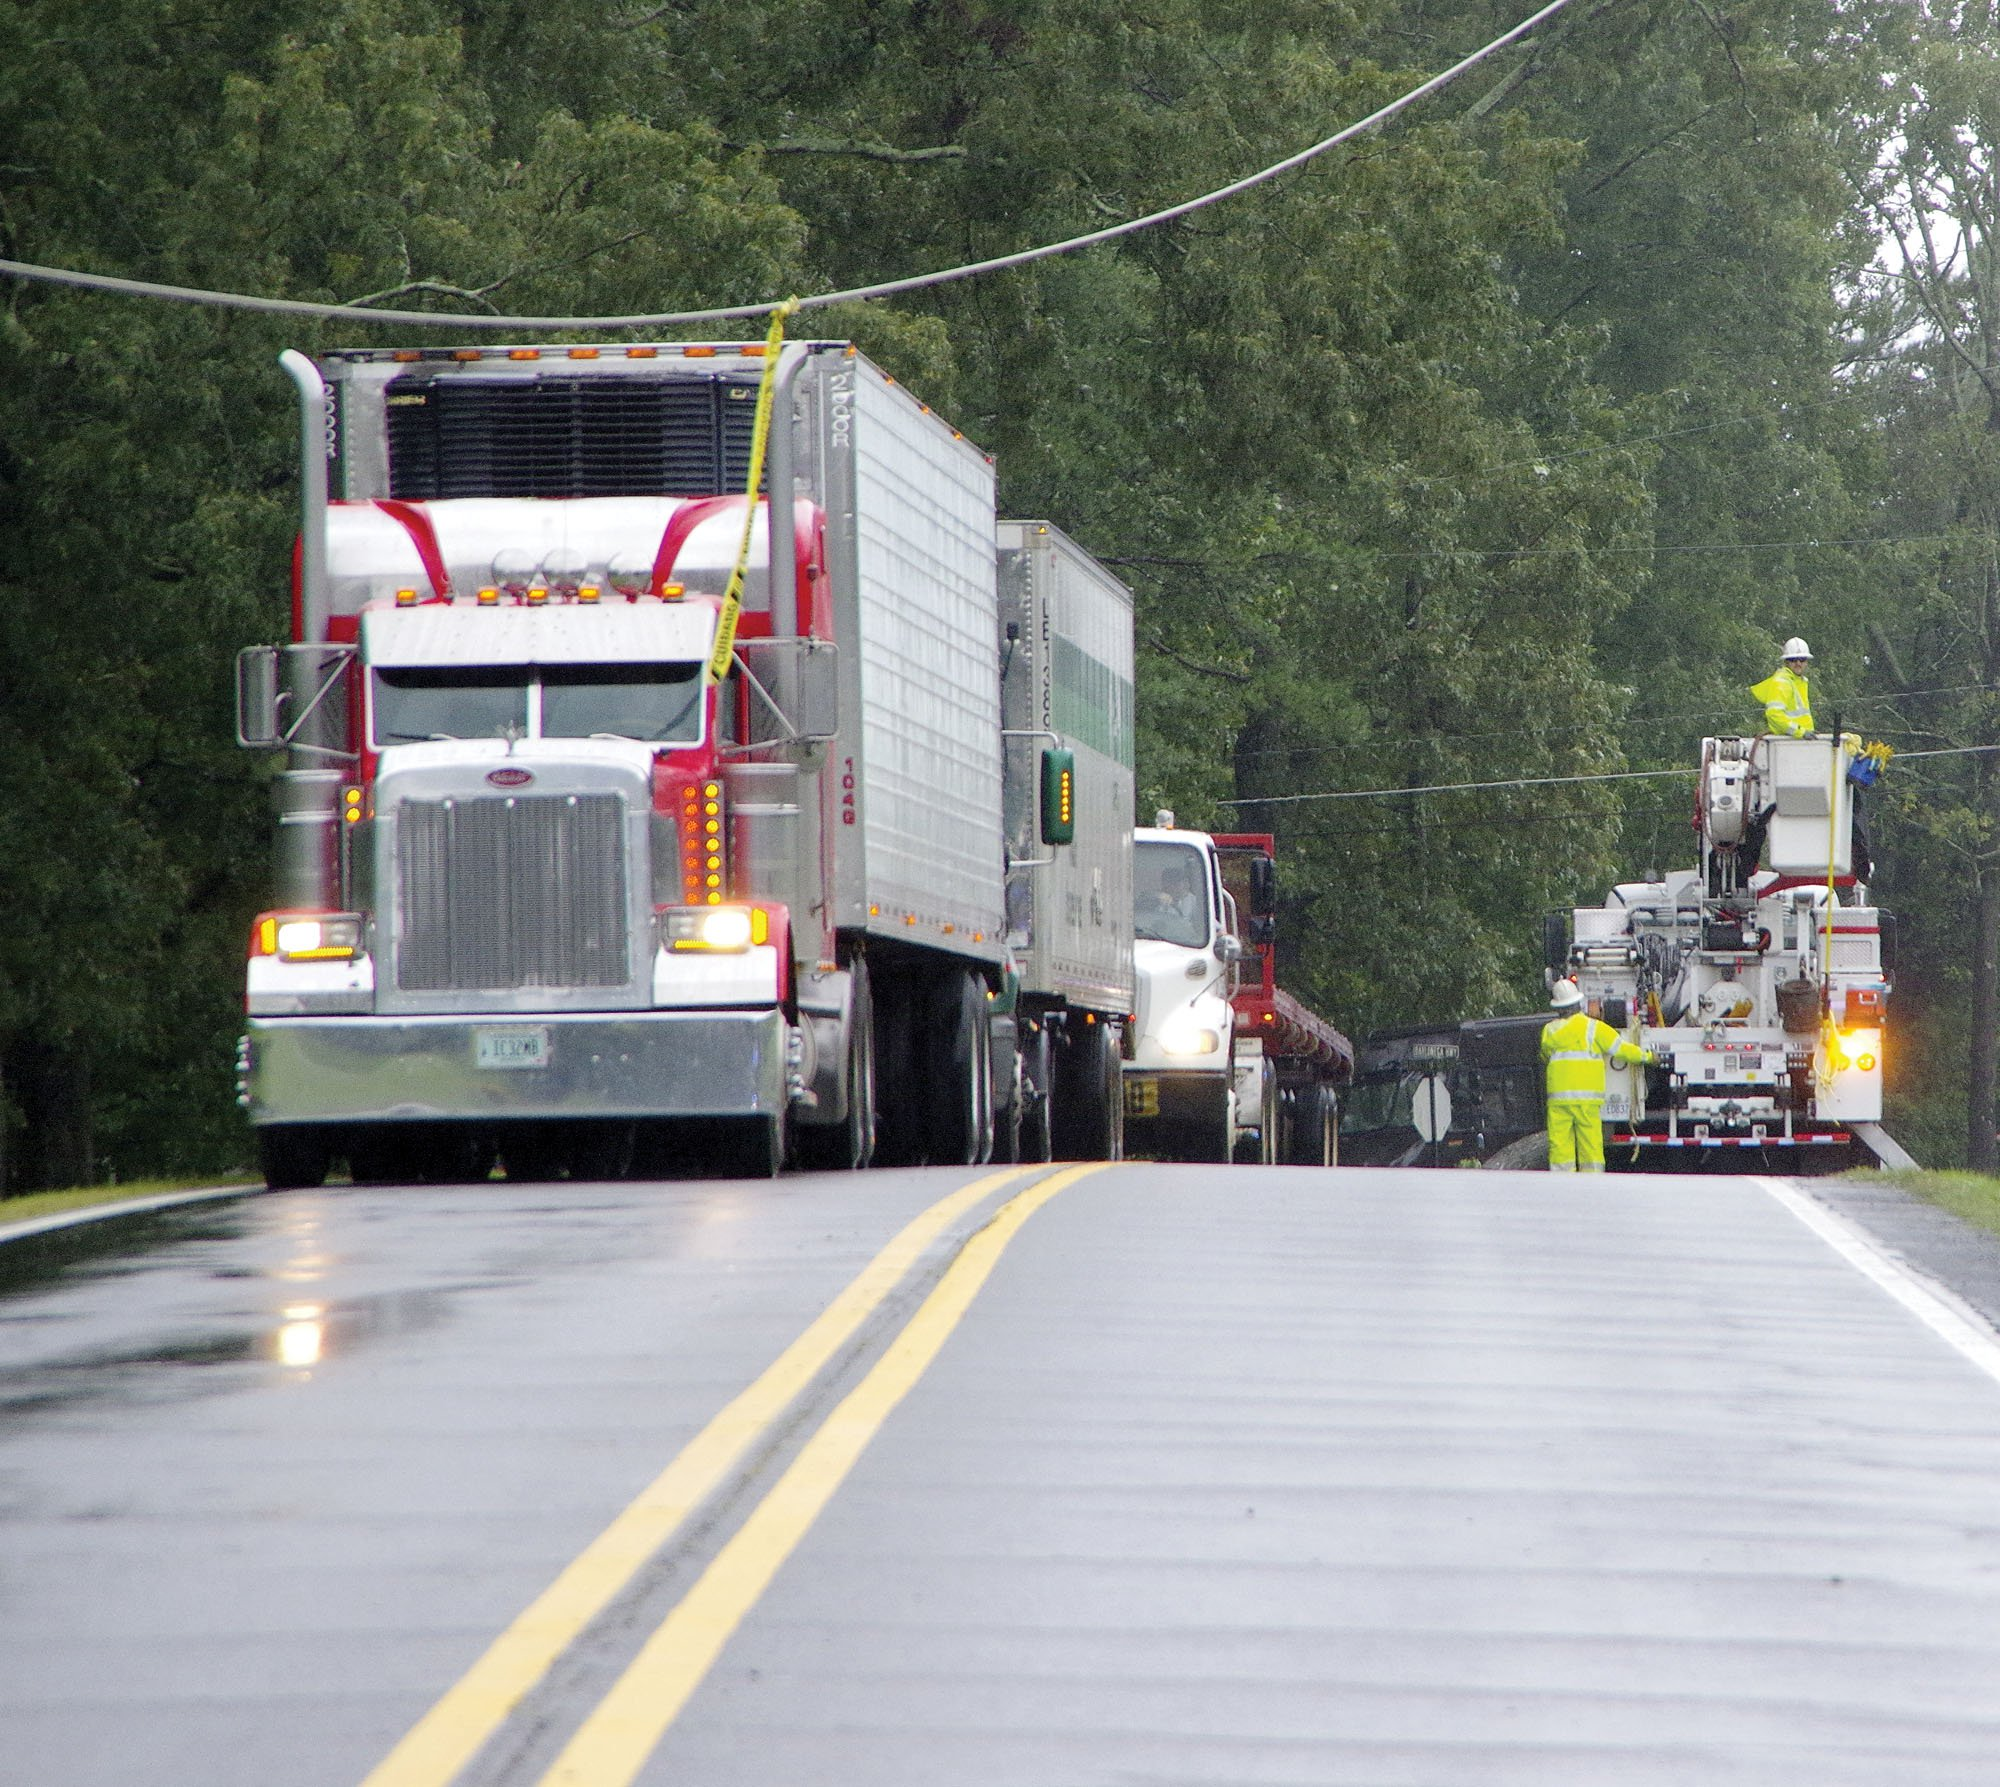 Dahlonega Highway was blocked on Tuesday